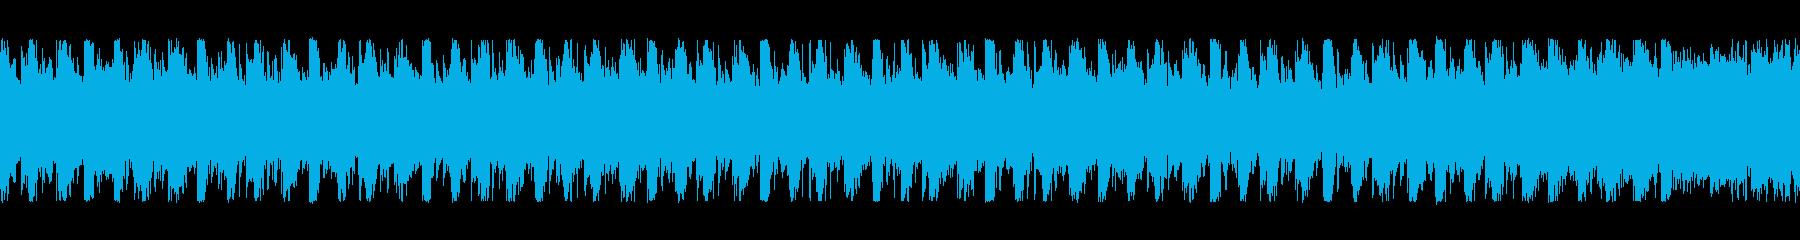 bpm137地味でおとなしいループテクノの再生済みの波形